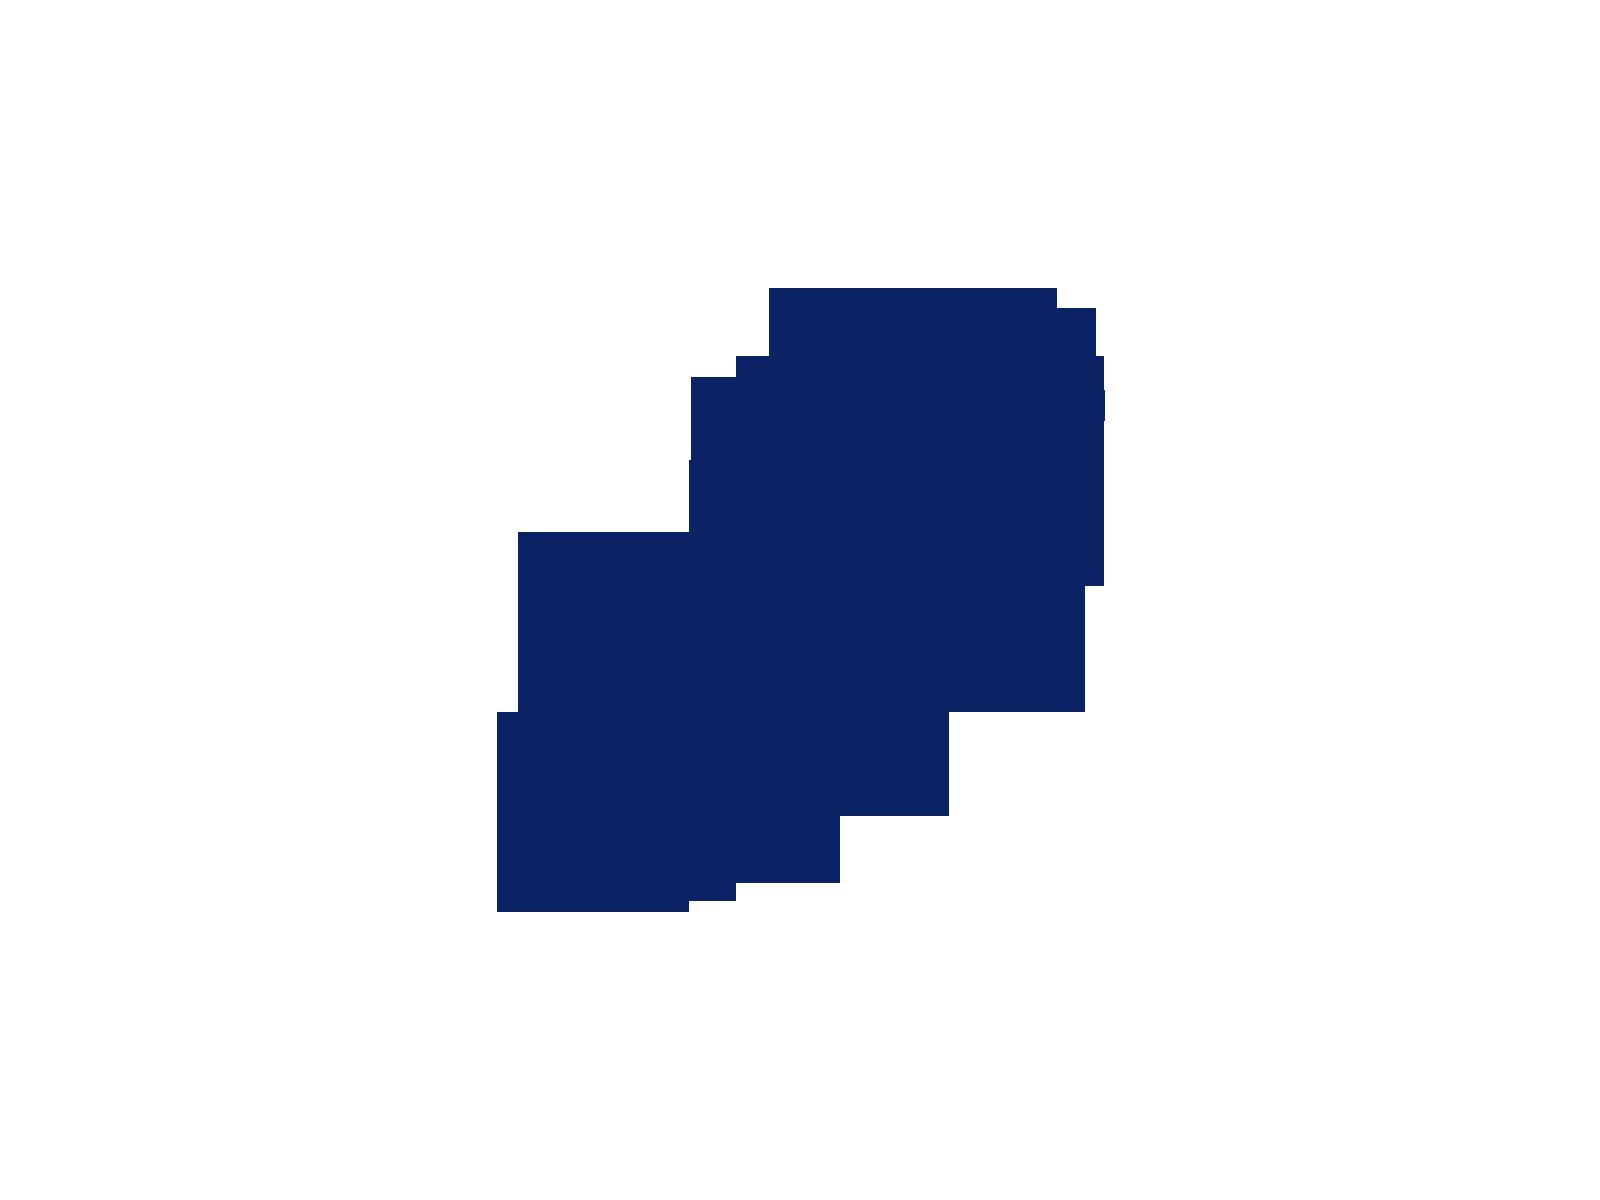 Asics logo - Asics 06 Logo Vector PNG